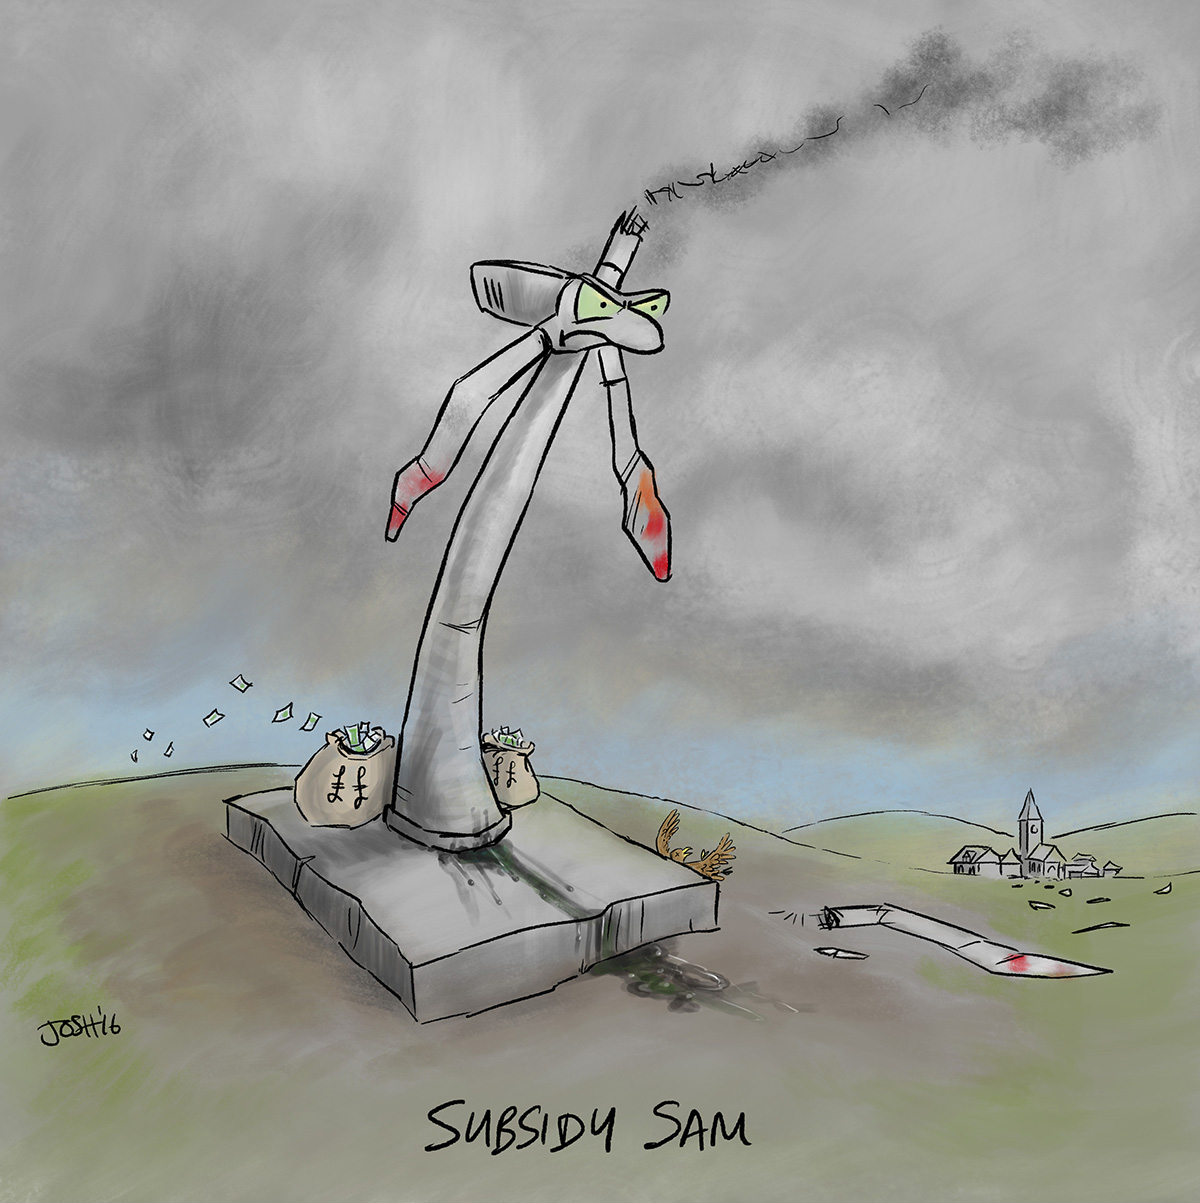 Subsidy-sam_scr.jpg